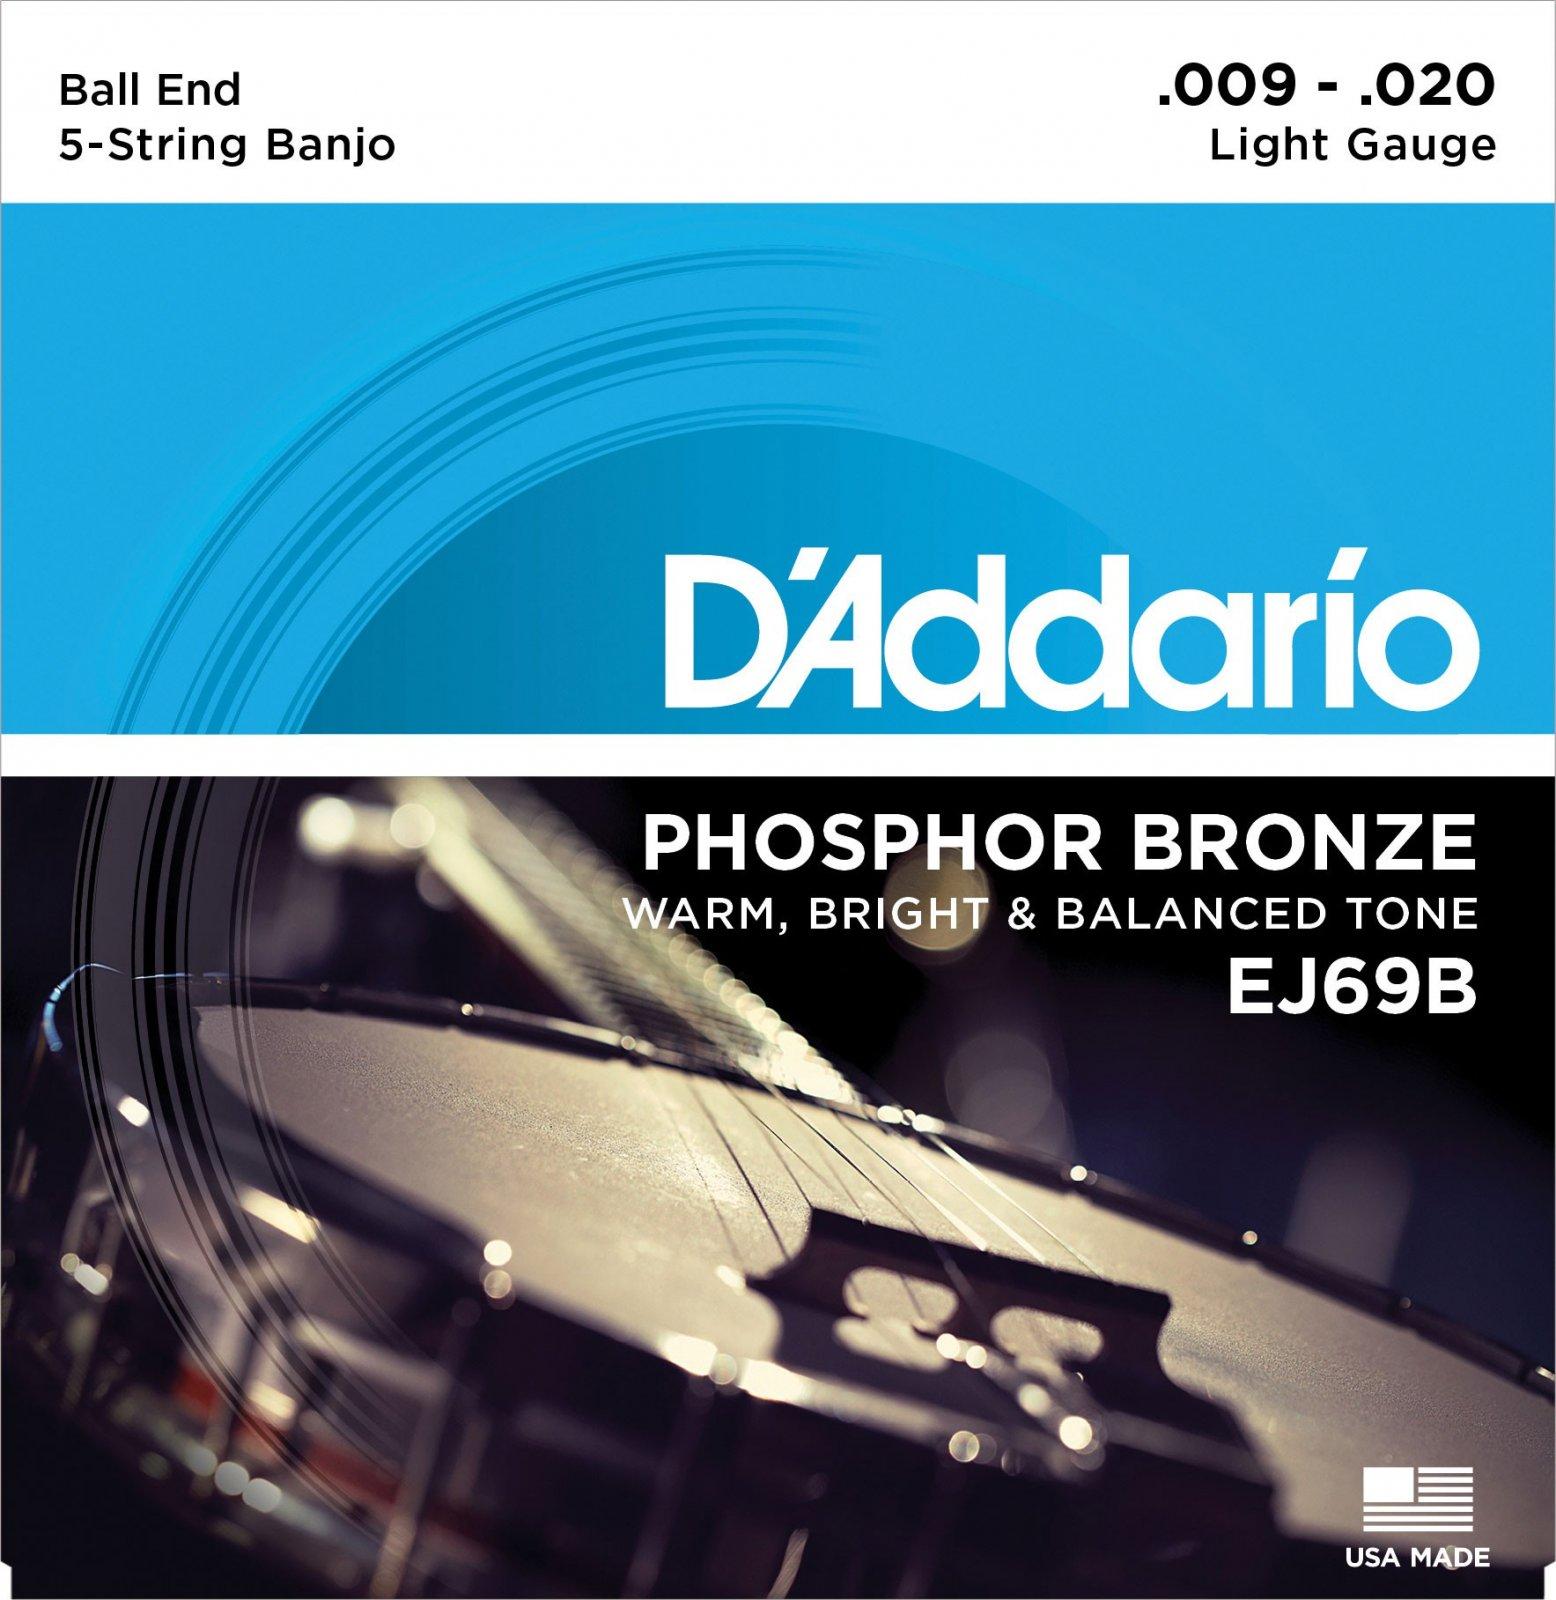 D'Addario Banjo Phosphor Bronze Light Ball End Set